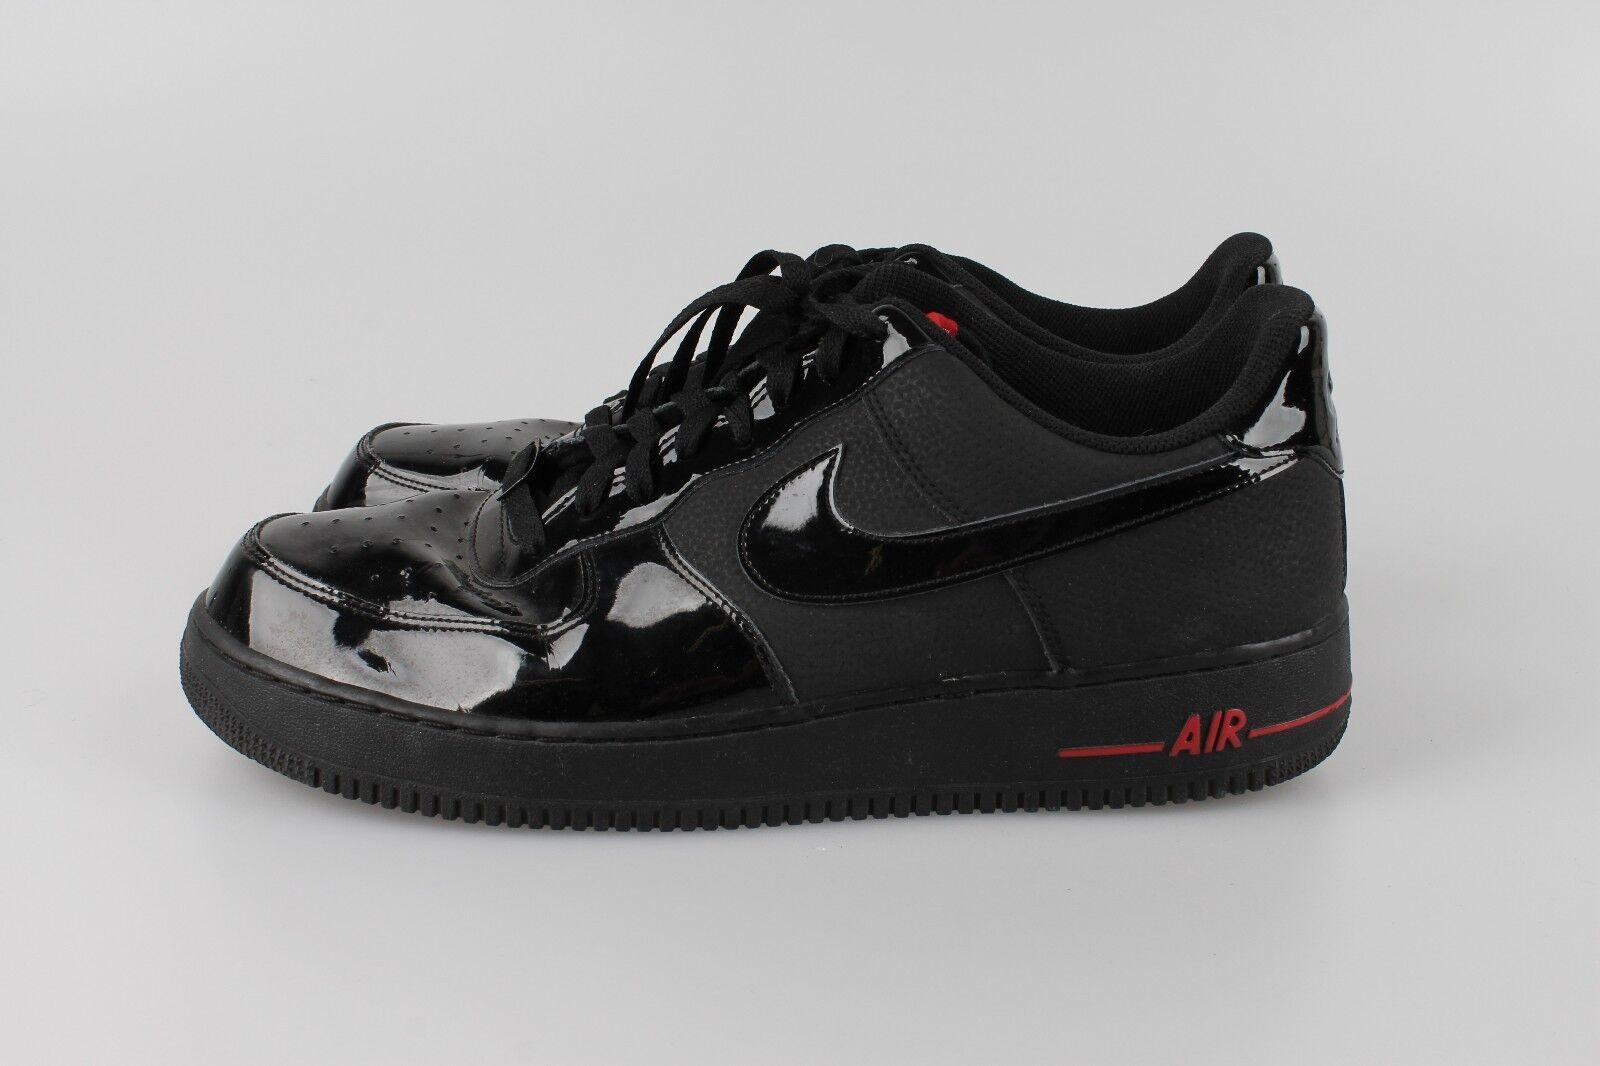 NIKE Air Force 1 '07 Low  47,5  Sport ROT Schwarz Lack  RAR  Herren Sneaker